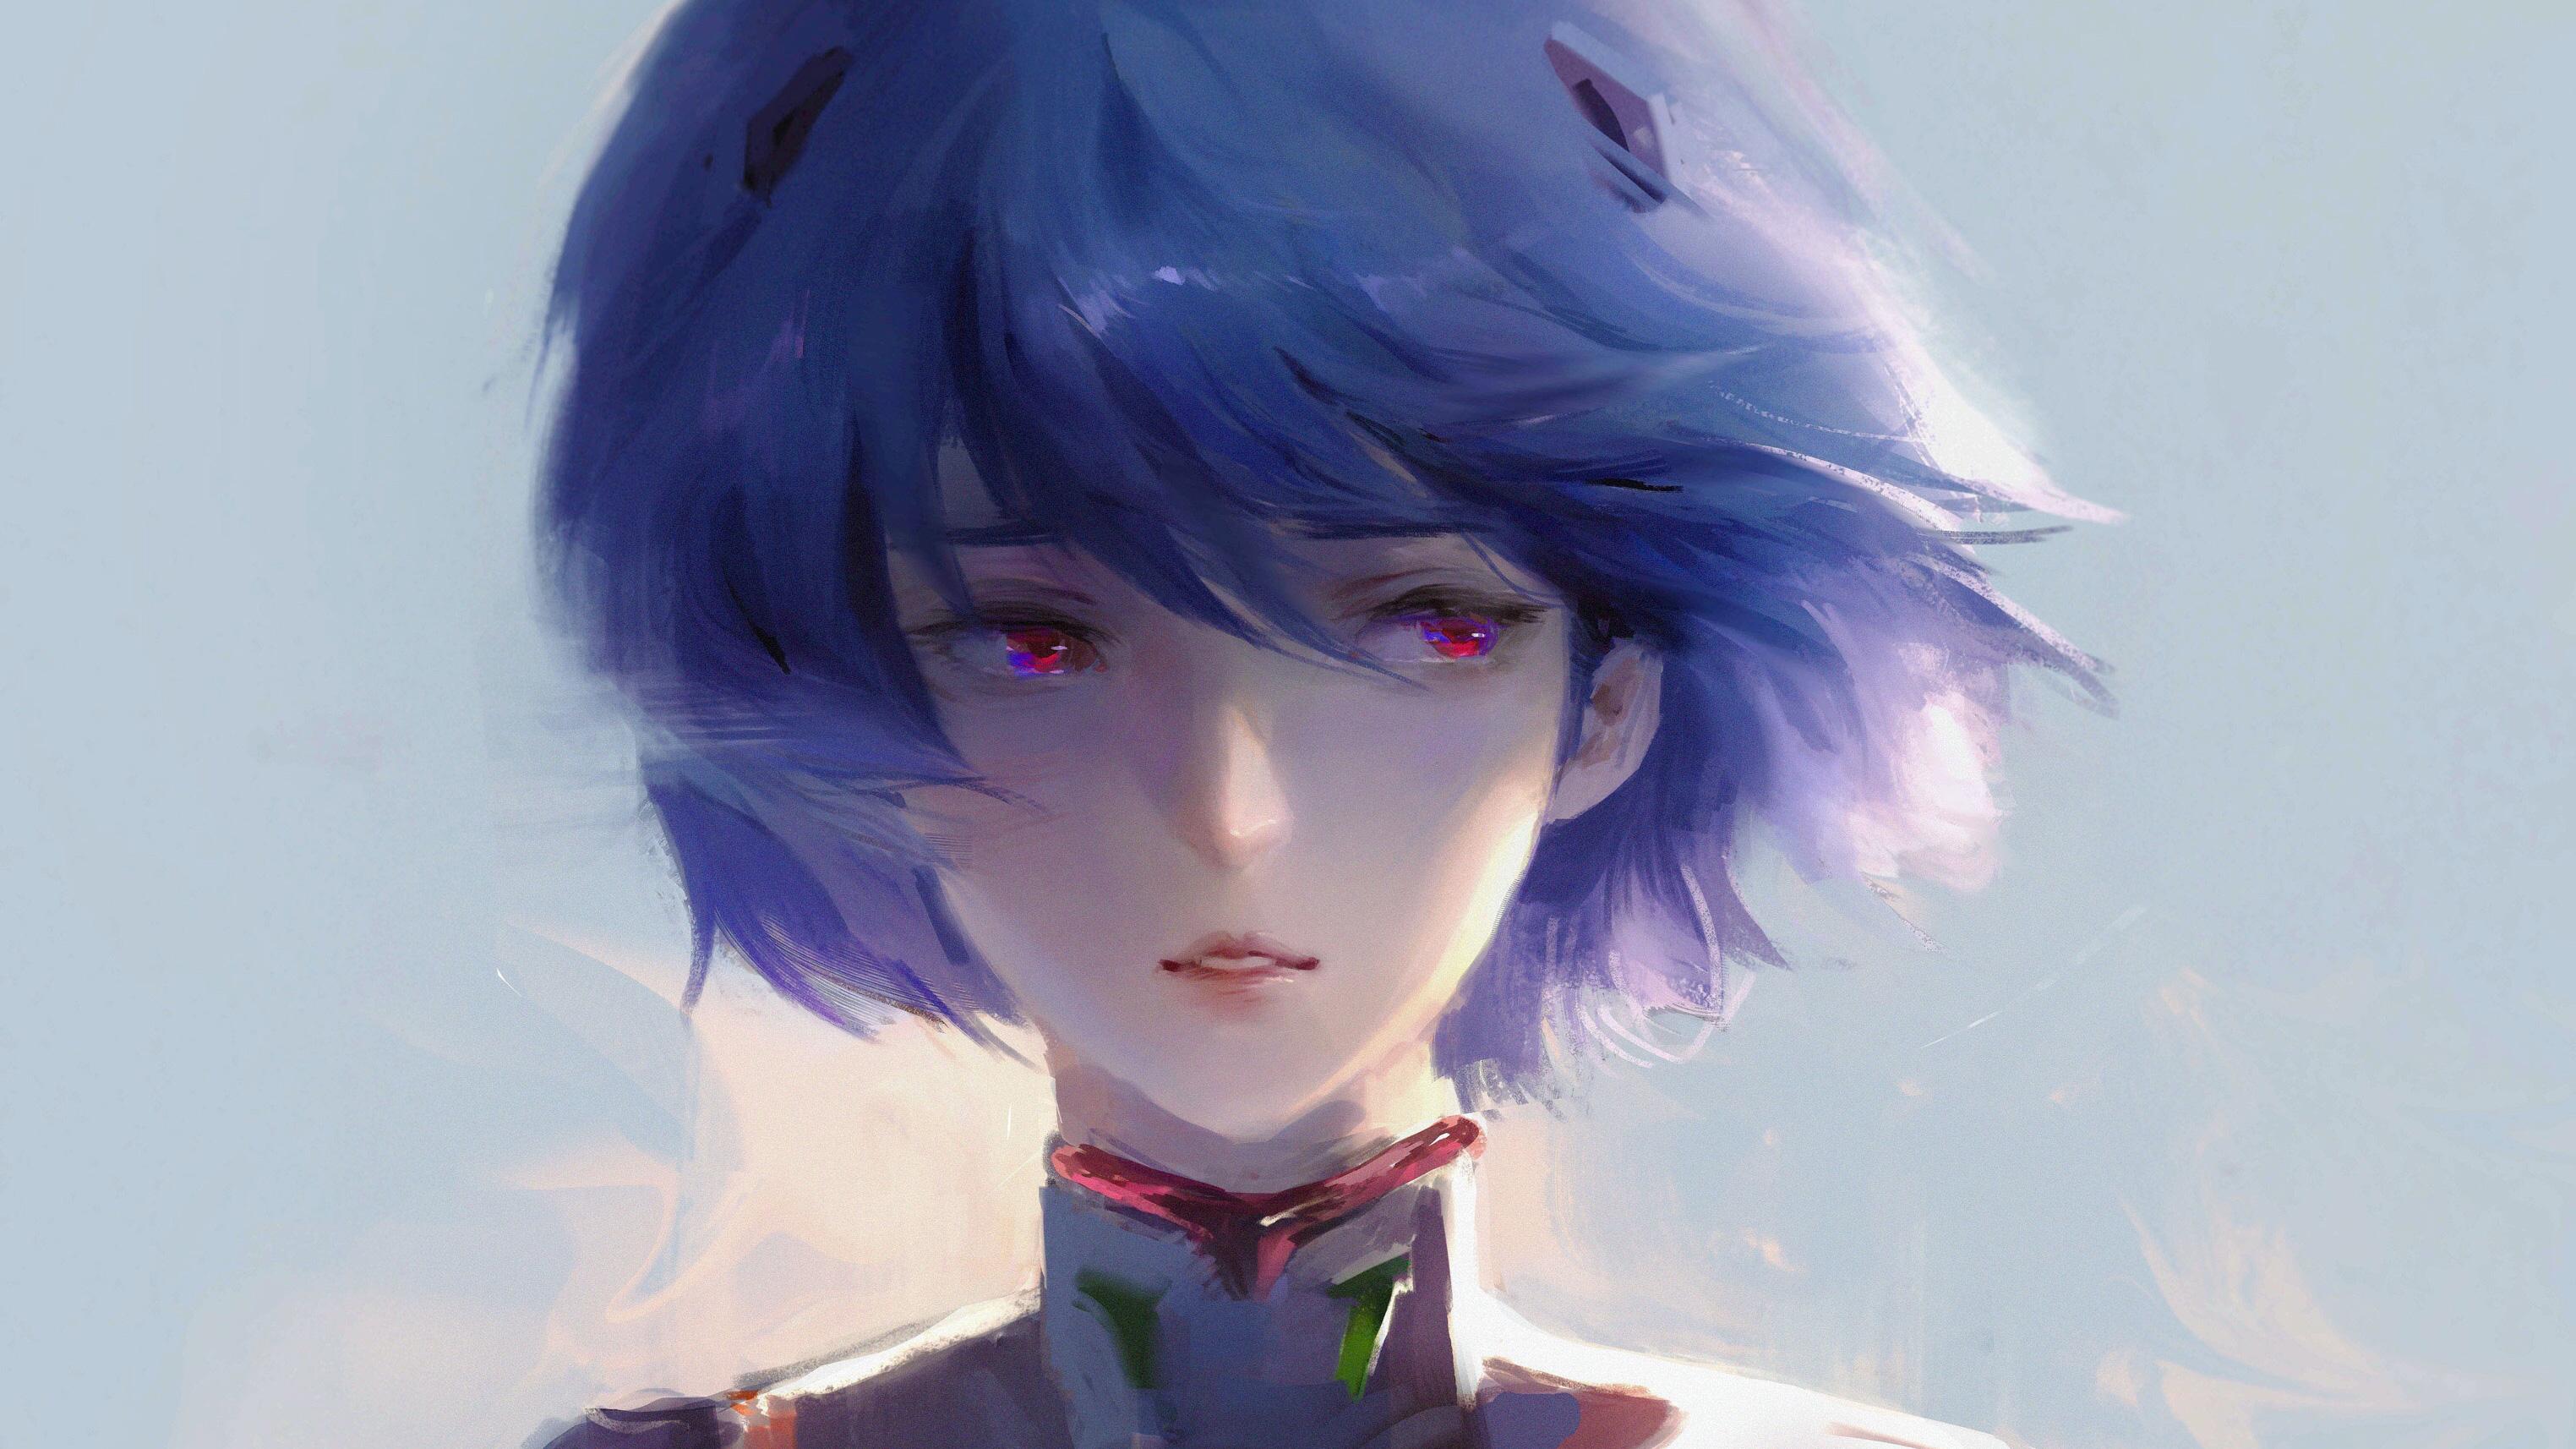 Neon Genesis Evangelion Dcchris Artwork, HD Anime, 4k ...